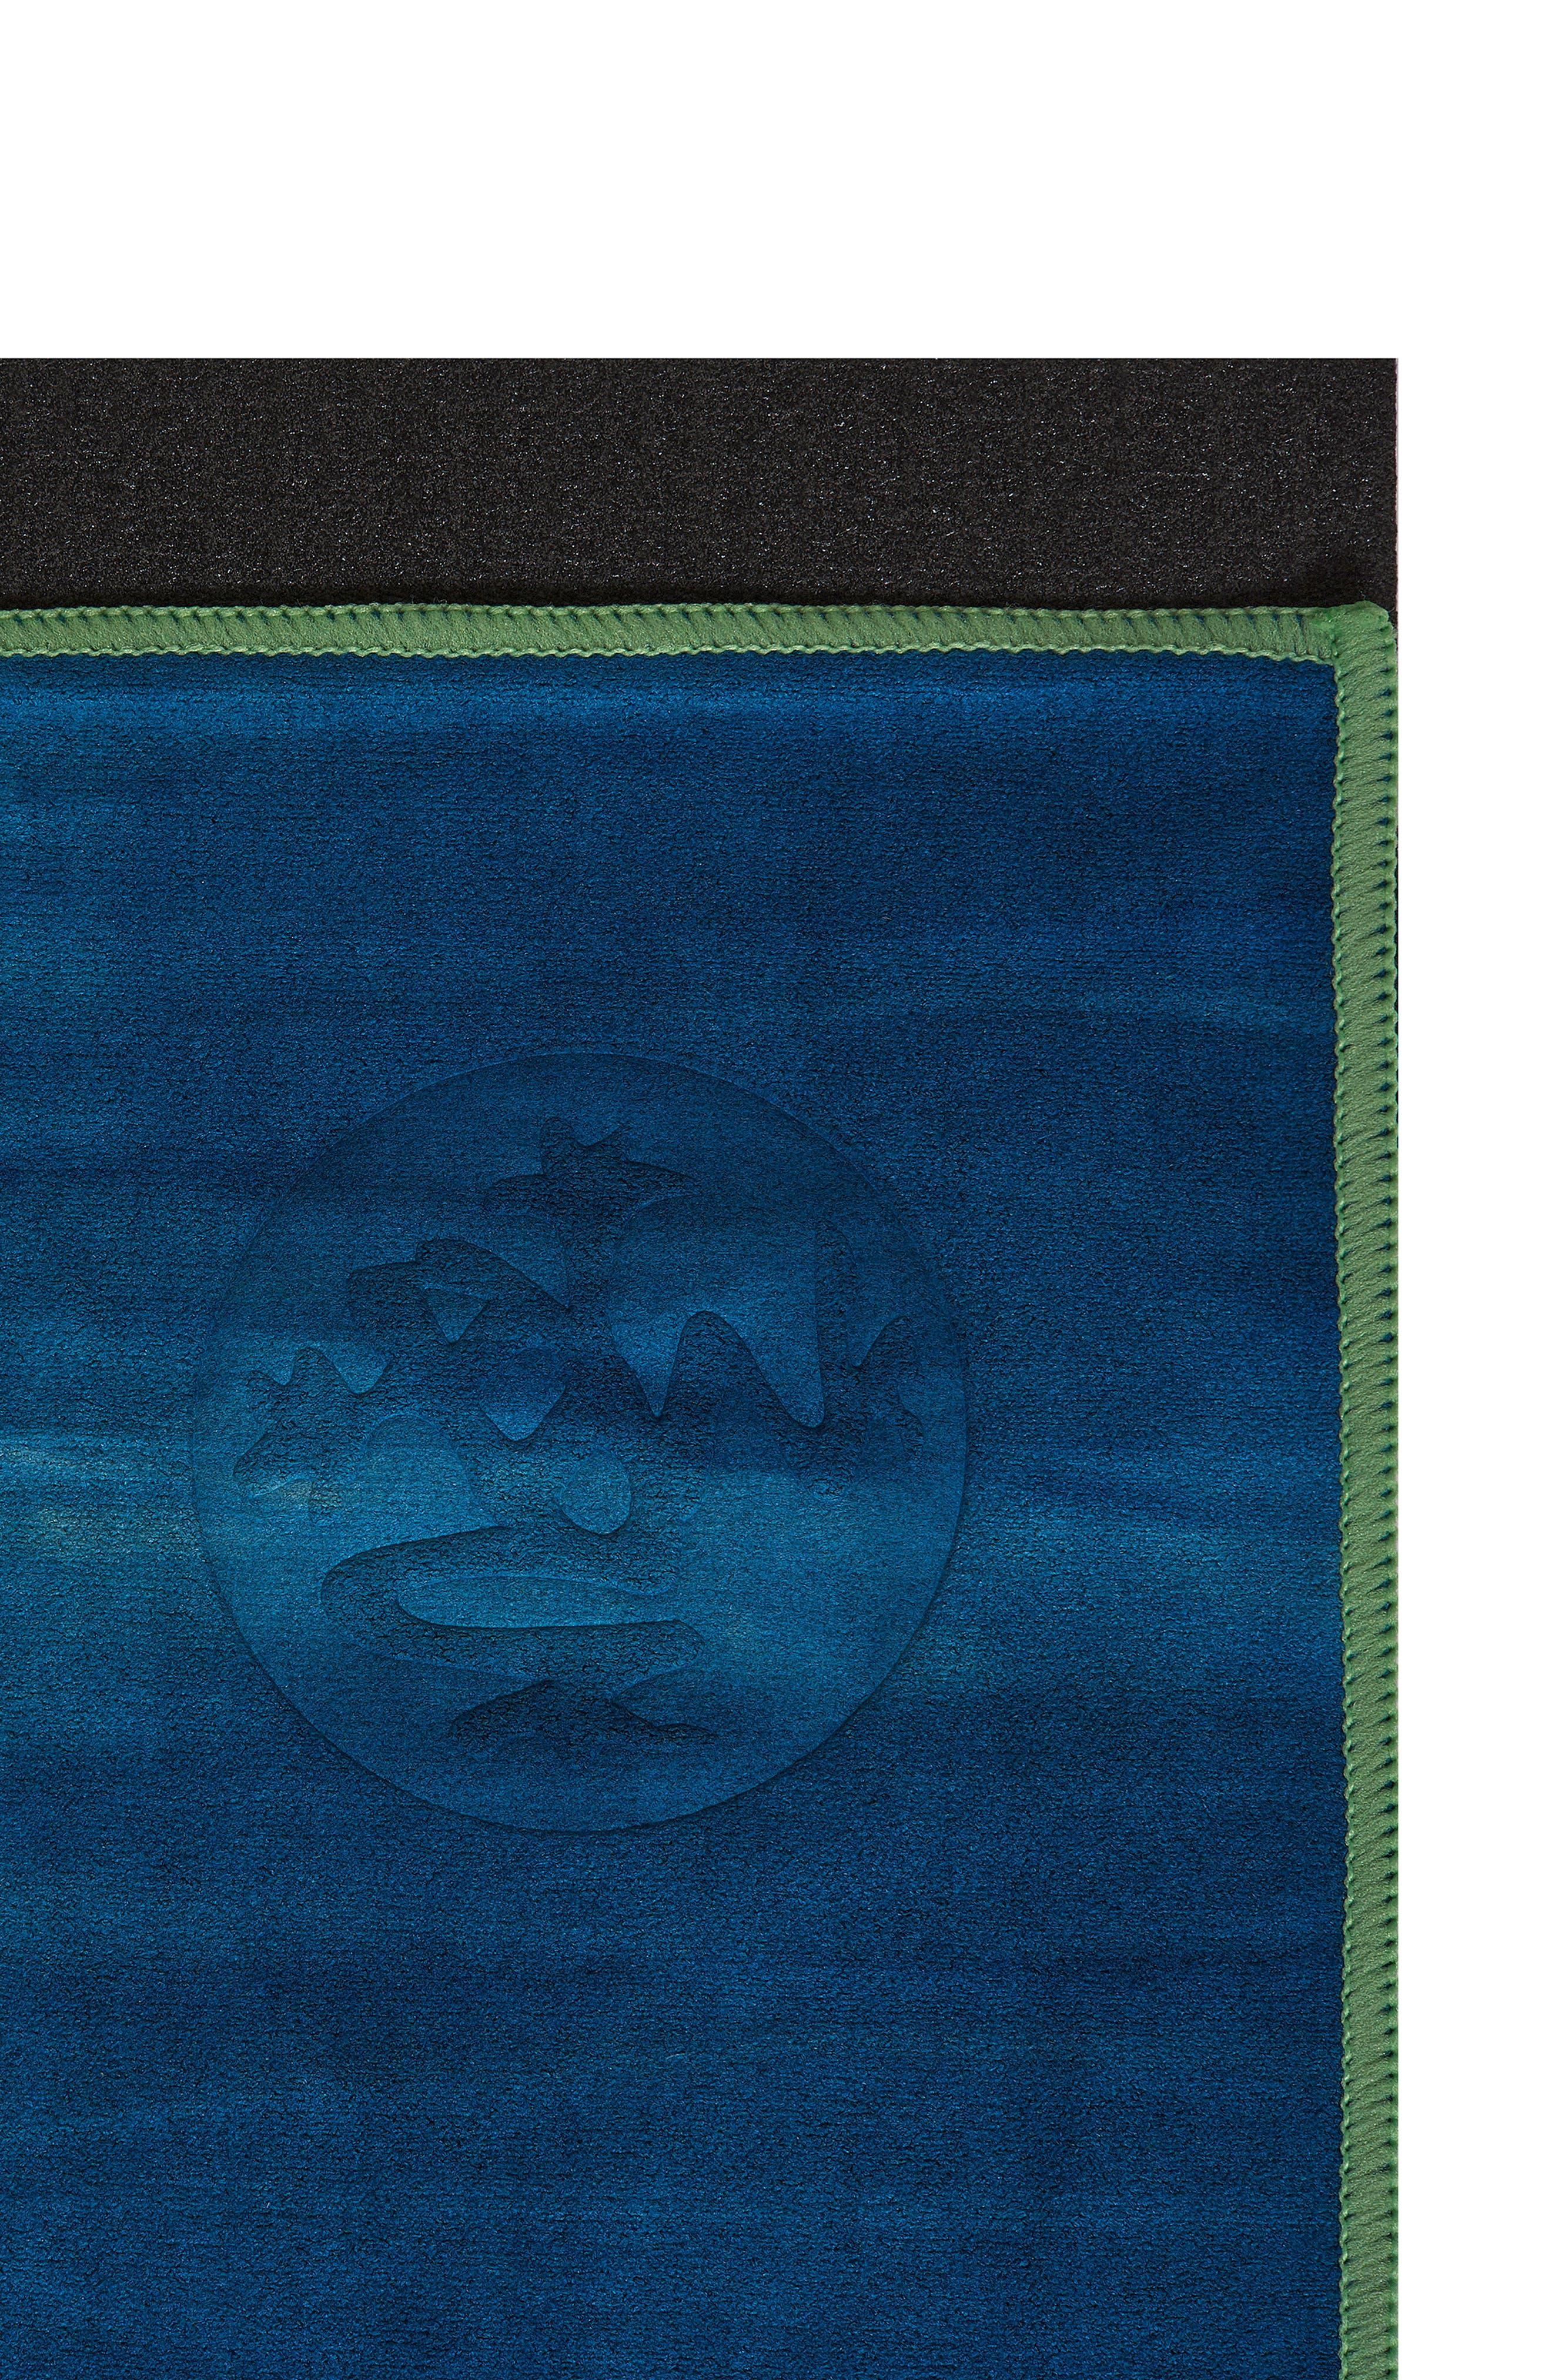 eQua<sup>®</sup> Hand Dyed Yoga Mat Towel,                             Alternate thumbnail 2, color,                             460